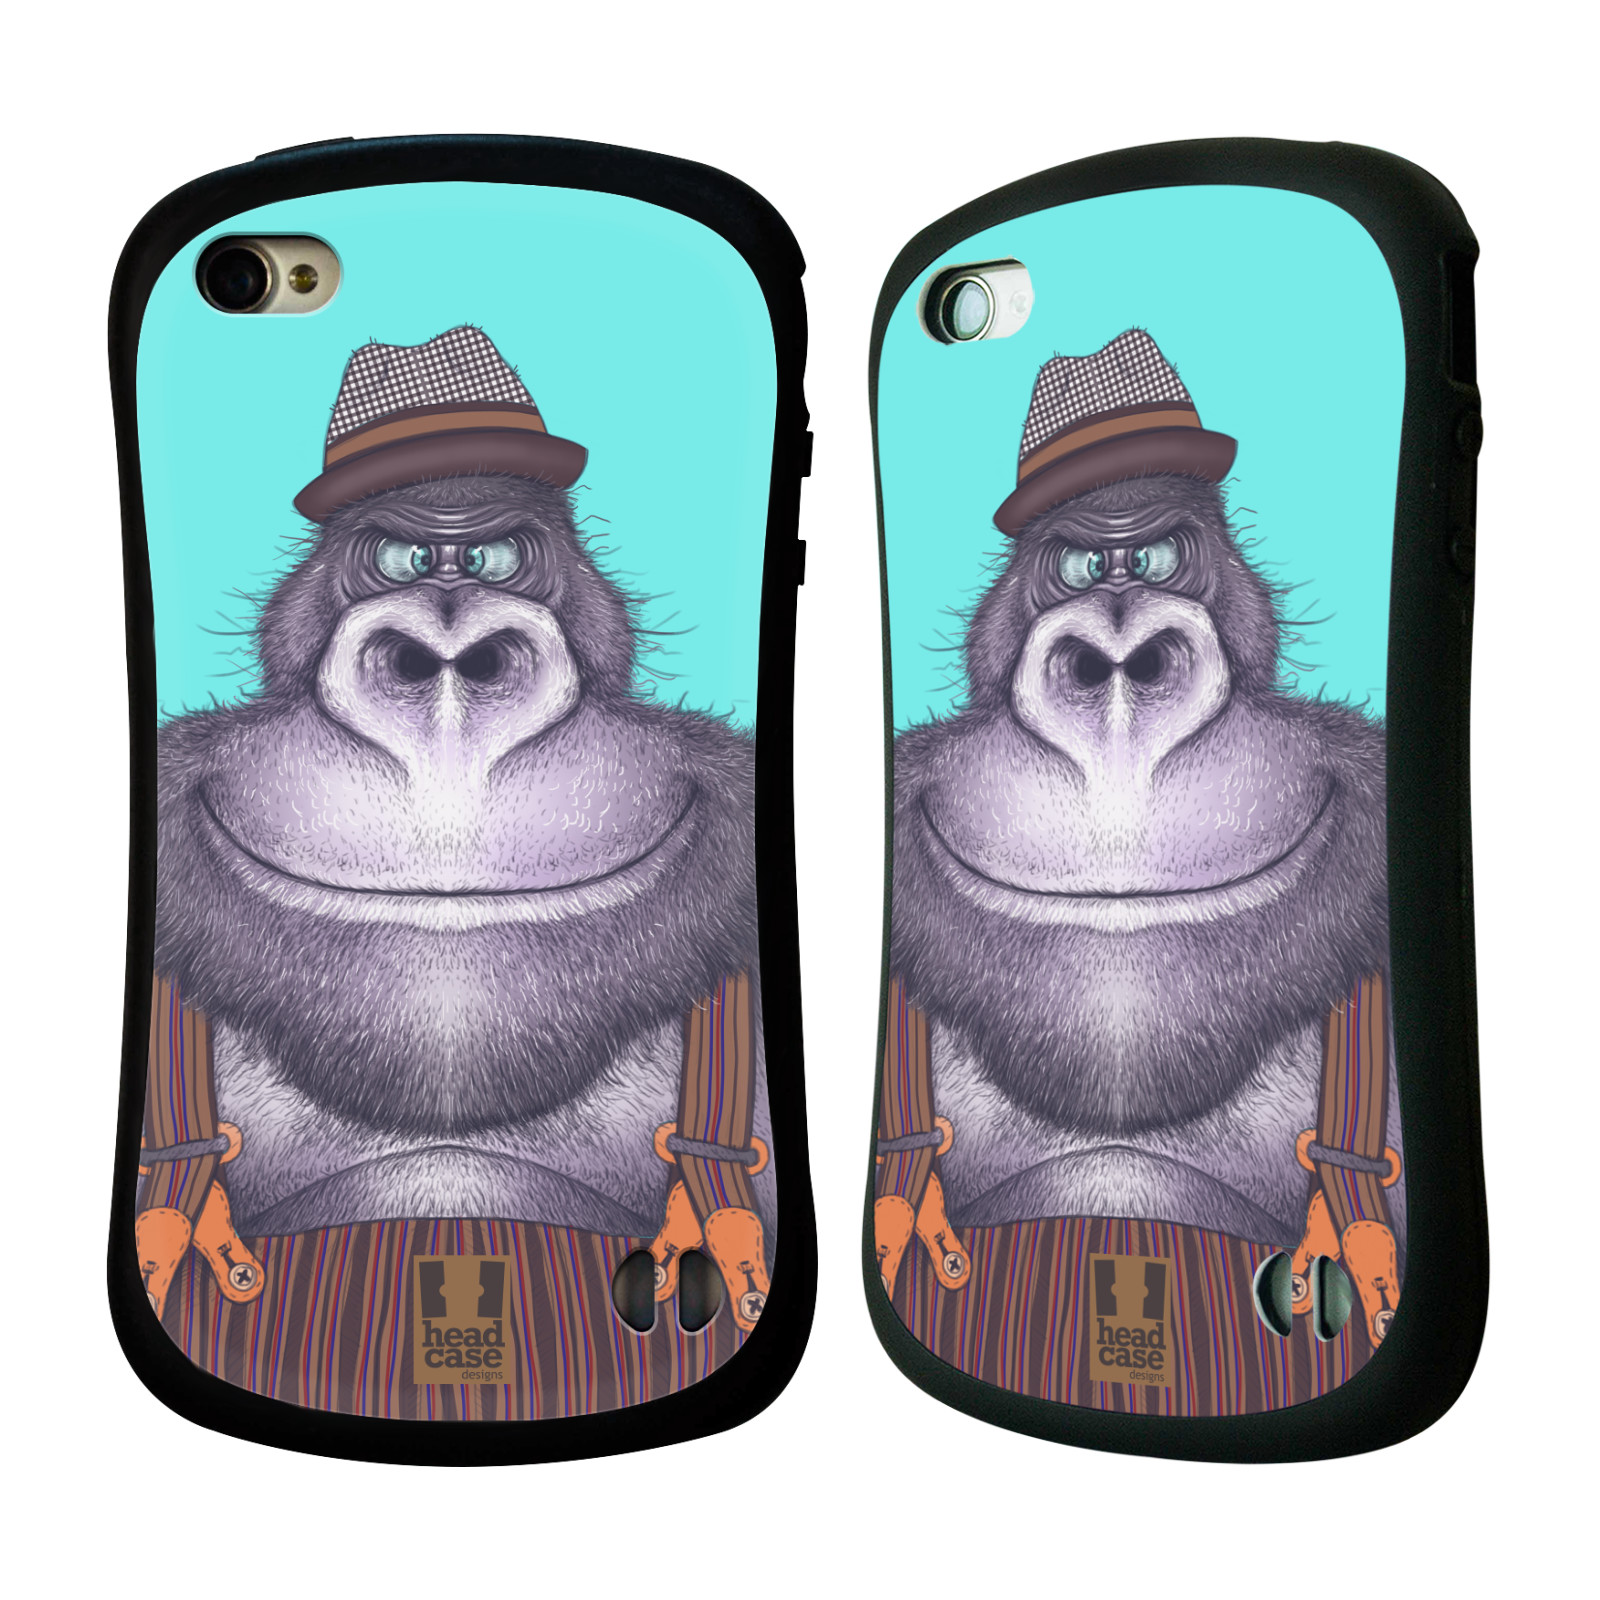 HEAD CASE silikon/plast odolný obal na mobil Apple Iphone 4/4S vzor Kreslená zvířátka gorila